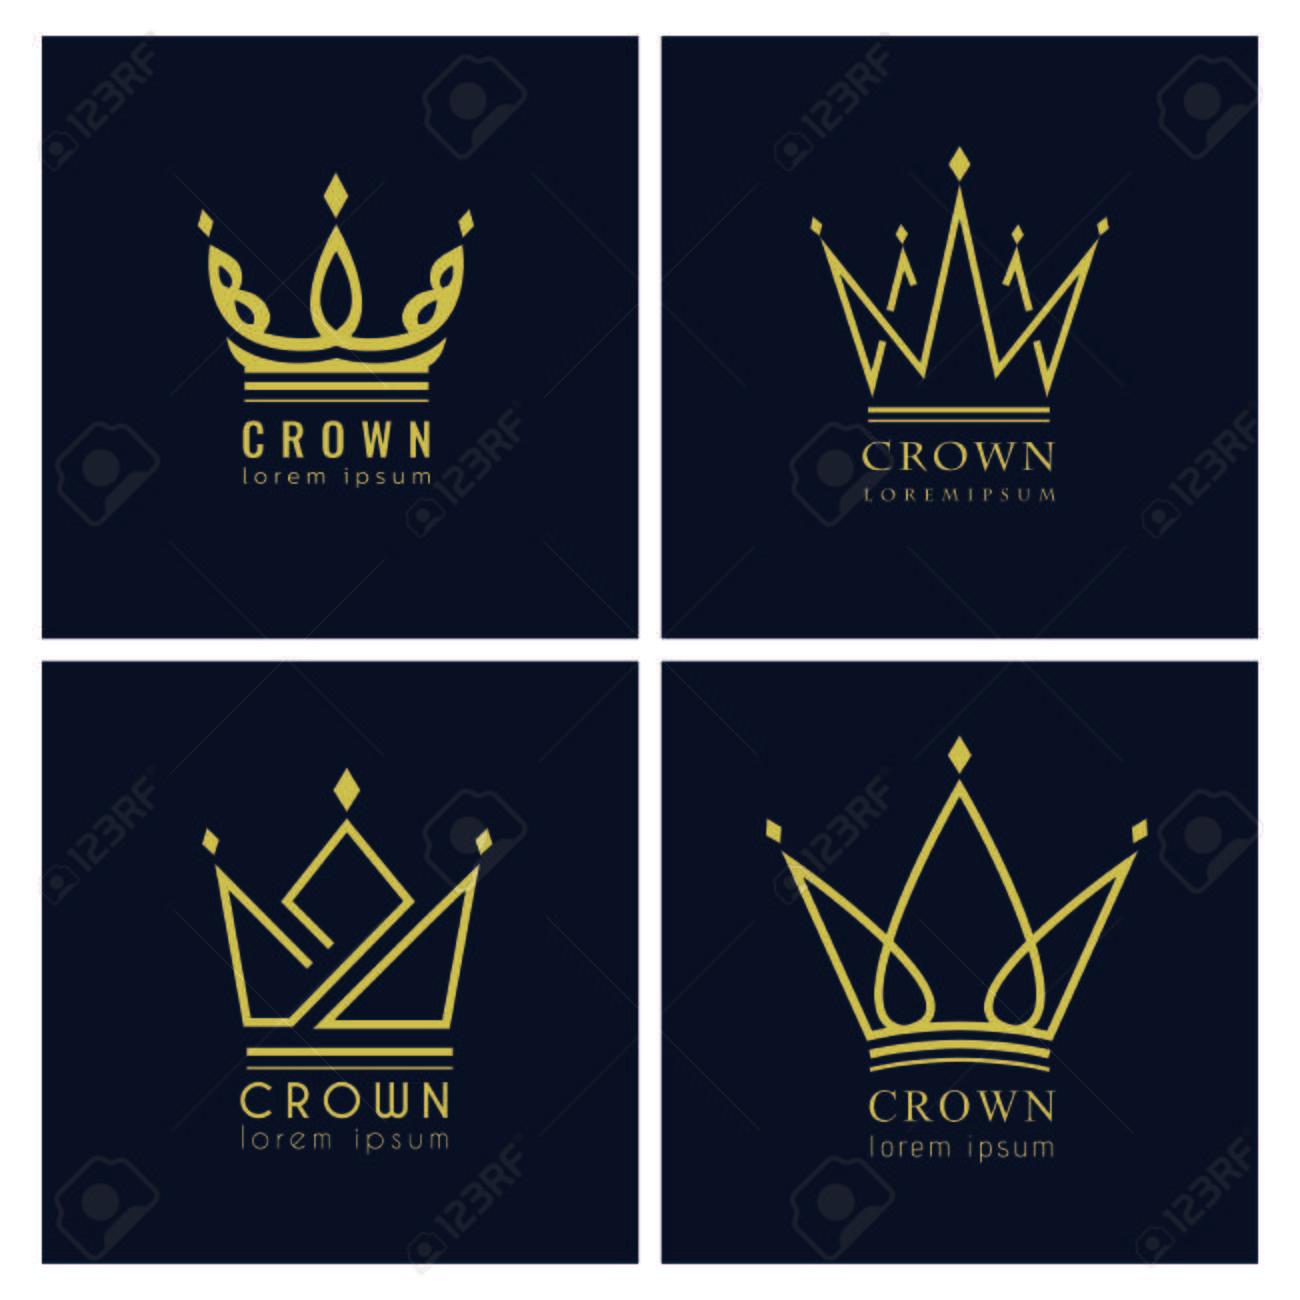 Vintage Crown Logo Royal King Queen Abstract Logo Design Vector Template. Clip Art Libres De Droits , Vecteurs Et Illustration. Image 114839817.